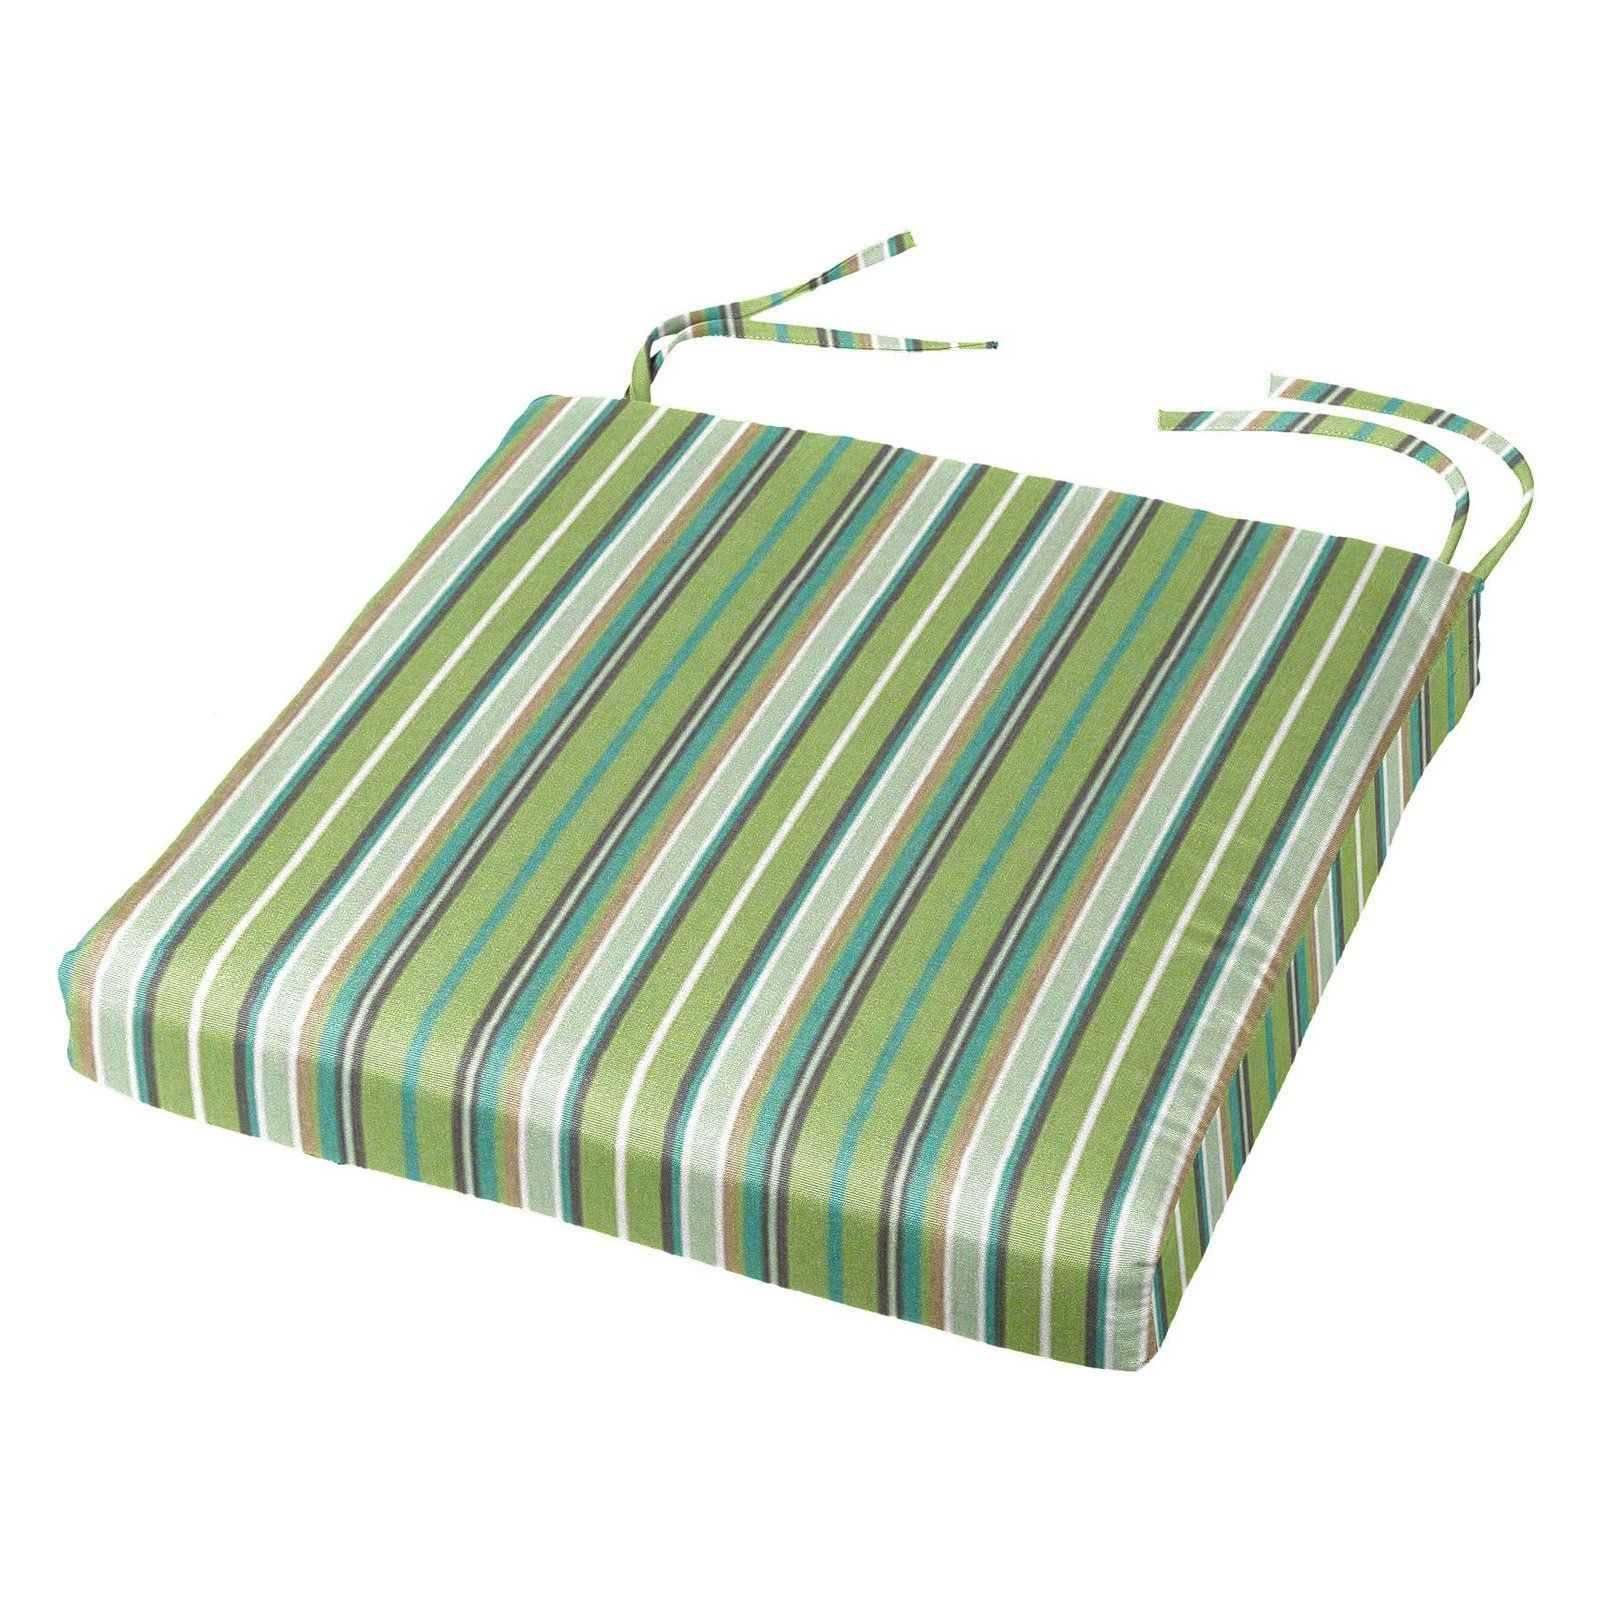 Cushion Source 19 X 18 In Striped Sunbrella Chair Pad Foster Surfside